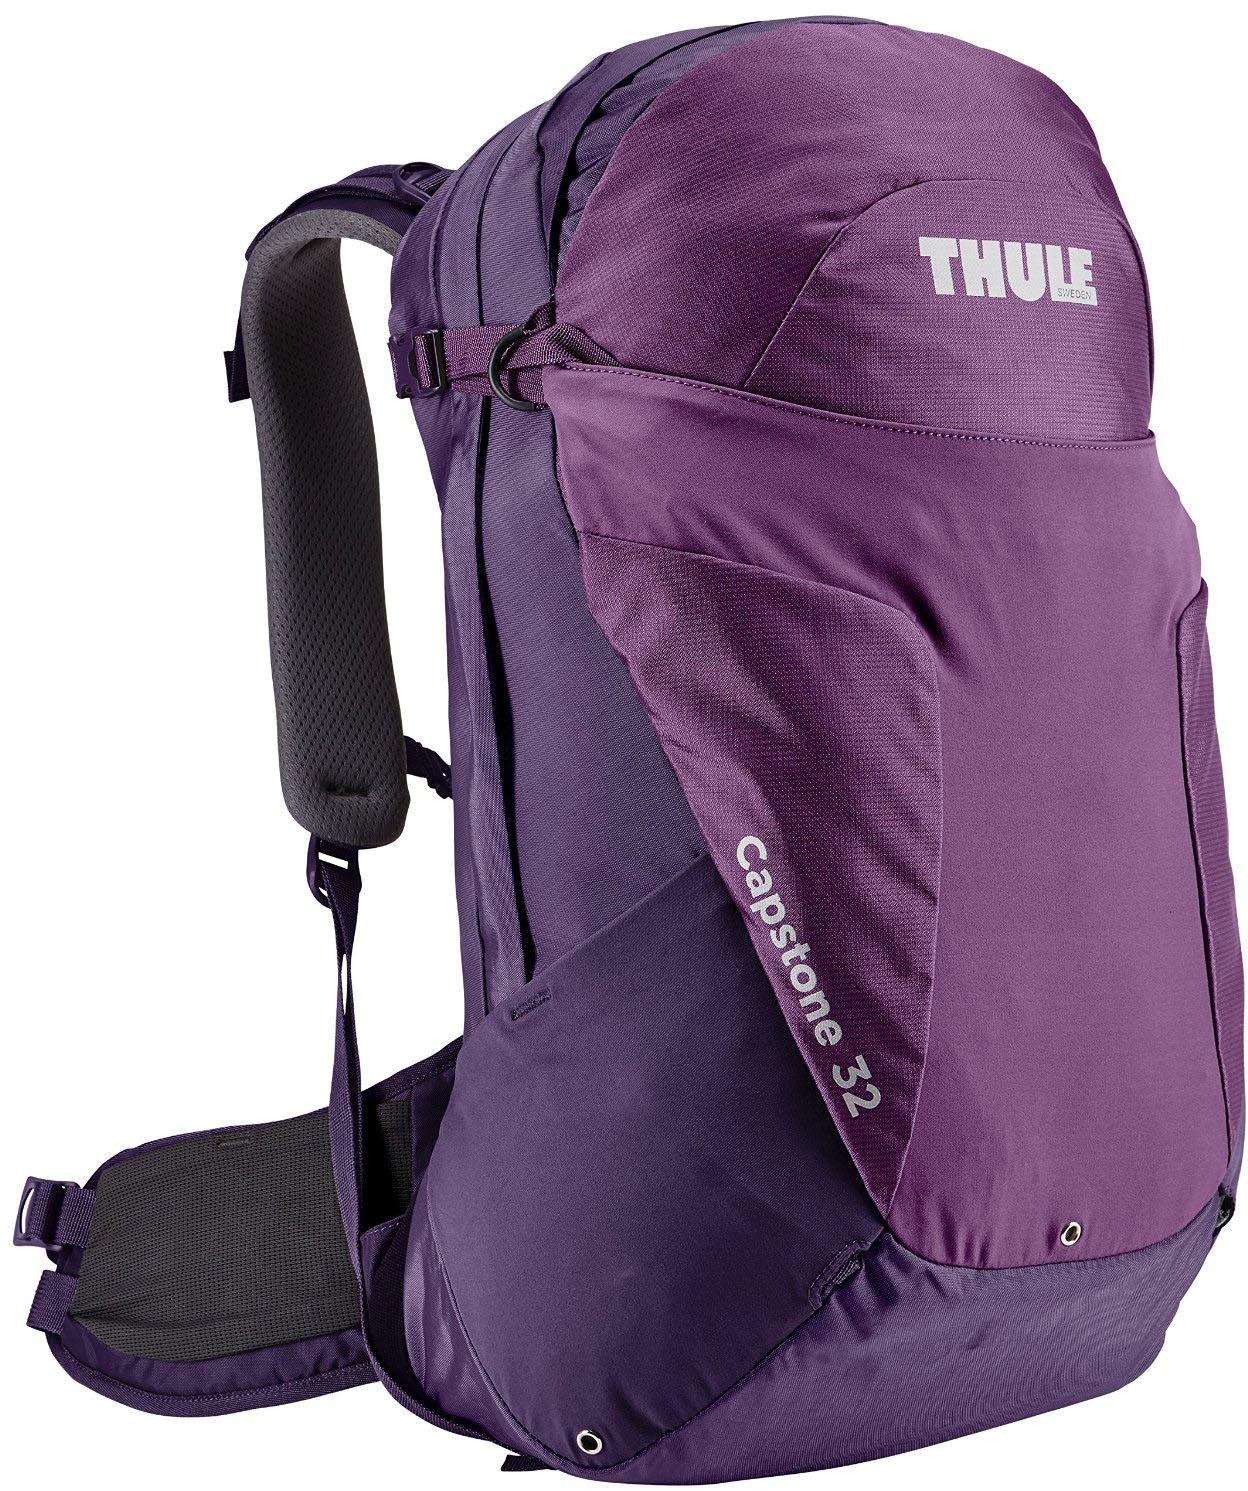 Thule Capstone Women's Hiking Pack 32L (207203) - женский треккинговый рюкзак (Сrown Jewel/Potion)